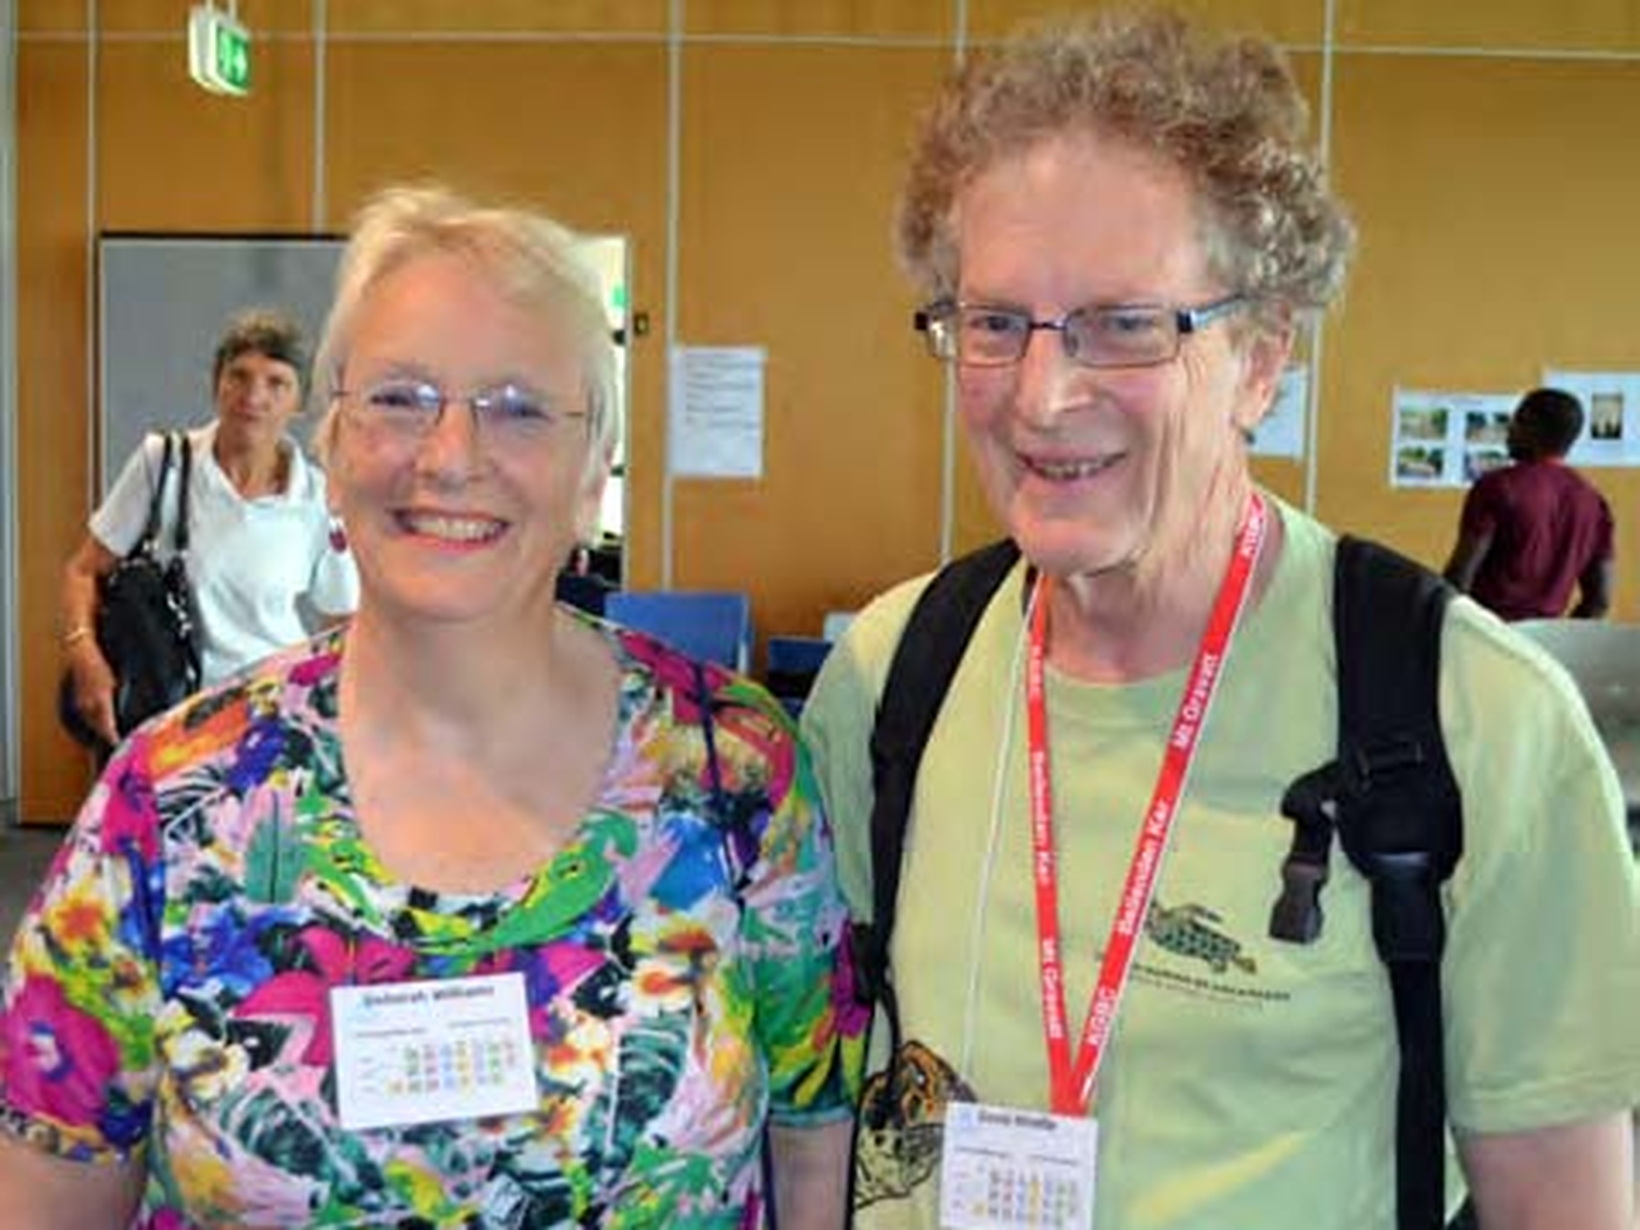 Deborah & David from Christchurch, New Zealand